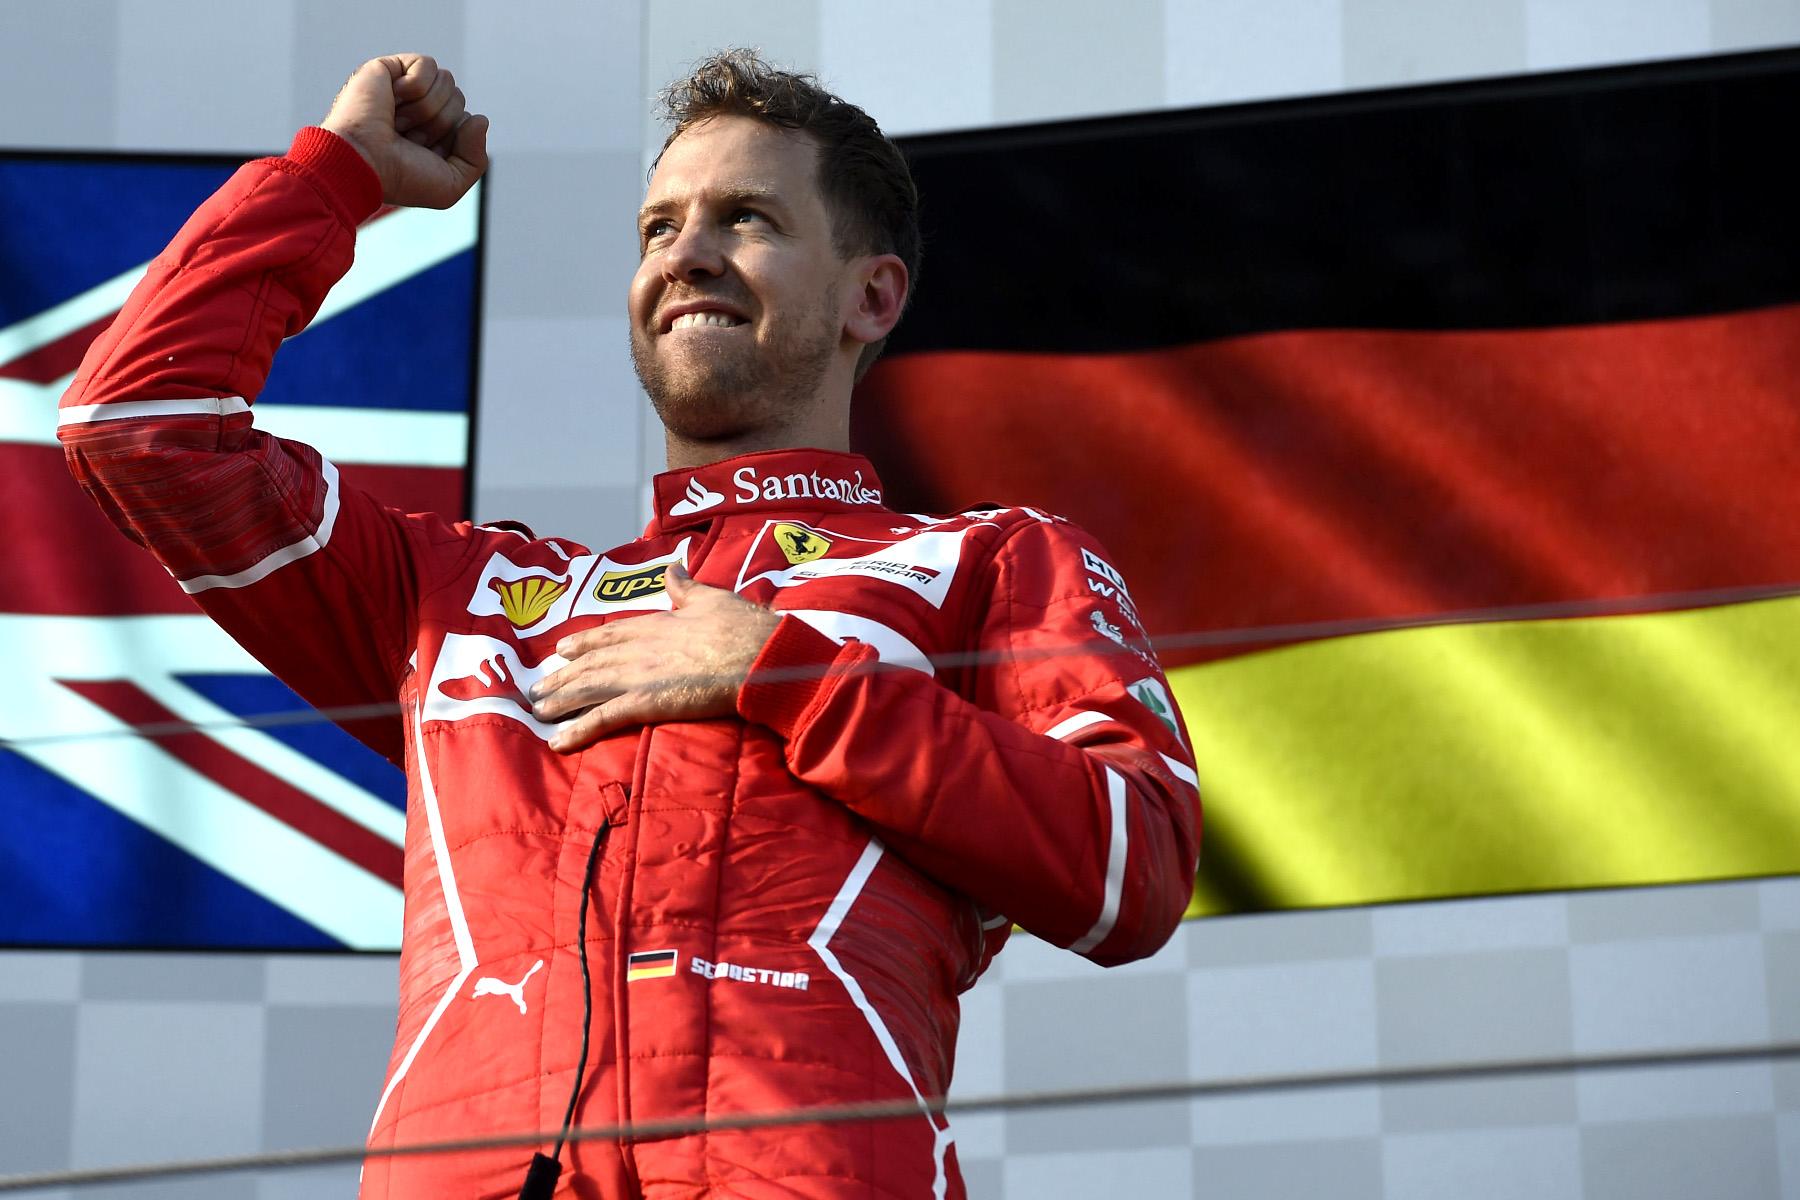 About time: Ferrari rejoices winning return